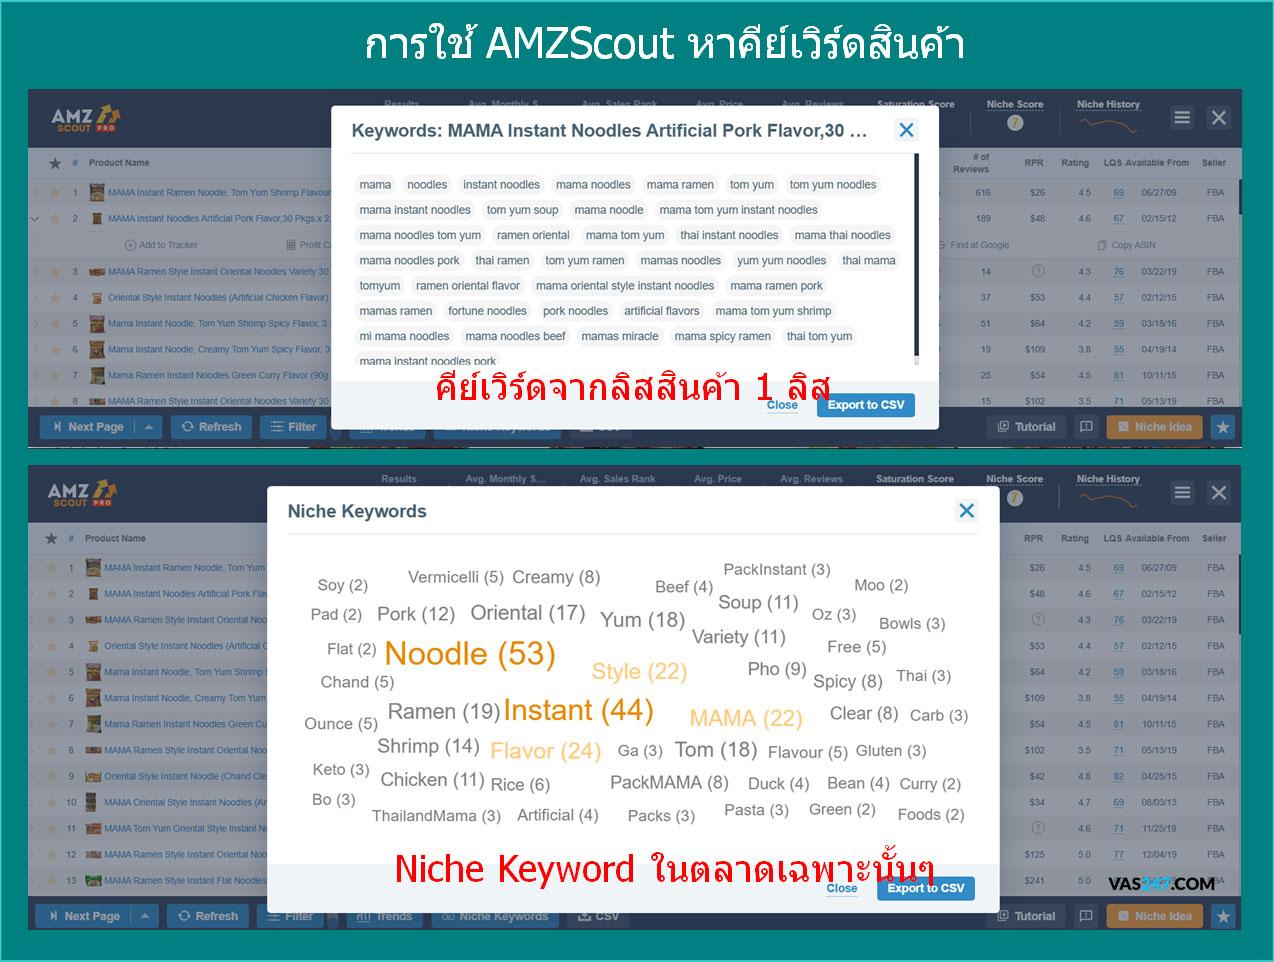 amazon คีเวิดสินค้า คีย์เวิร์ด keyword amazon search term